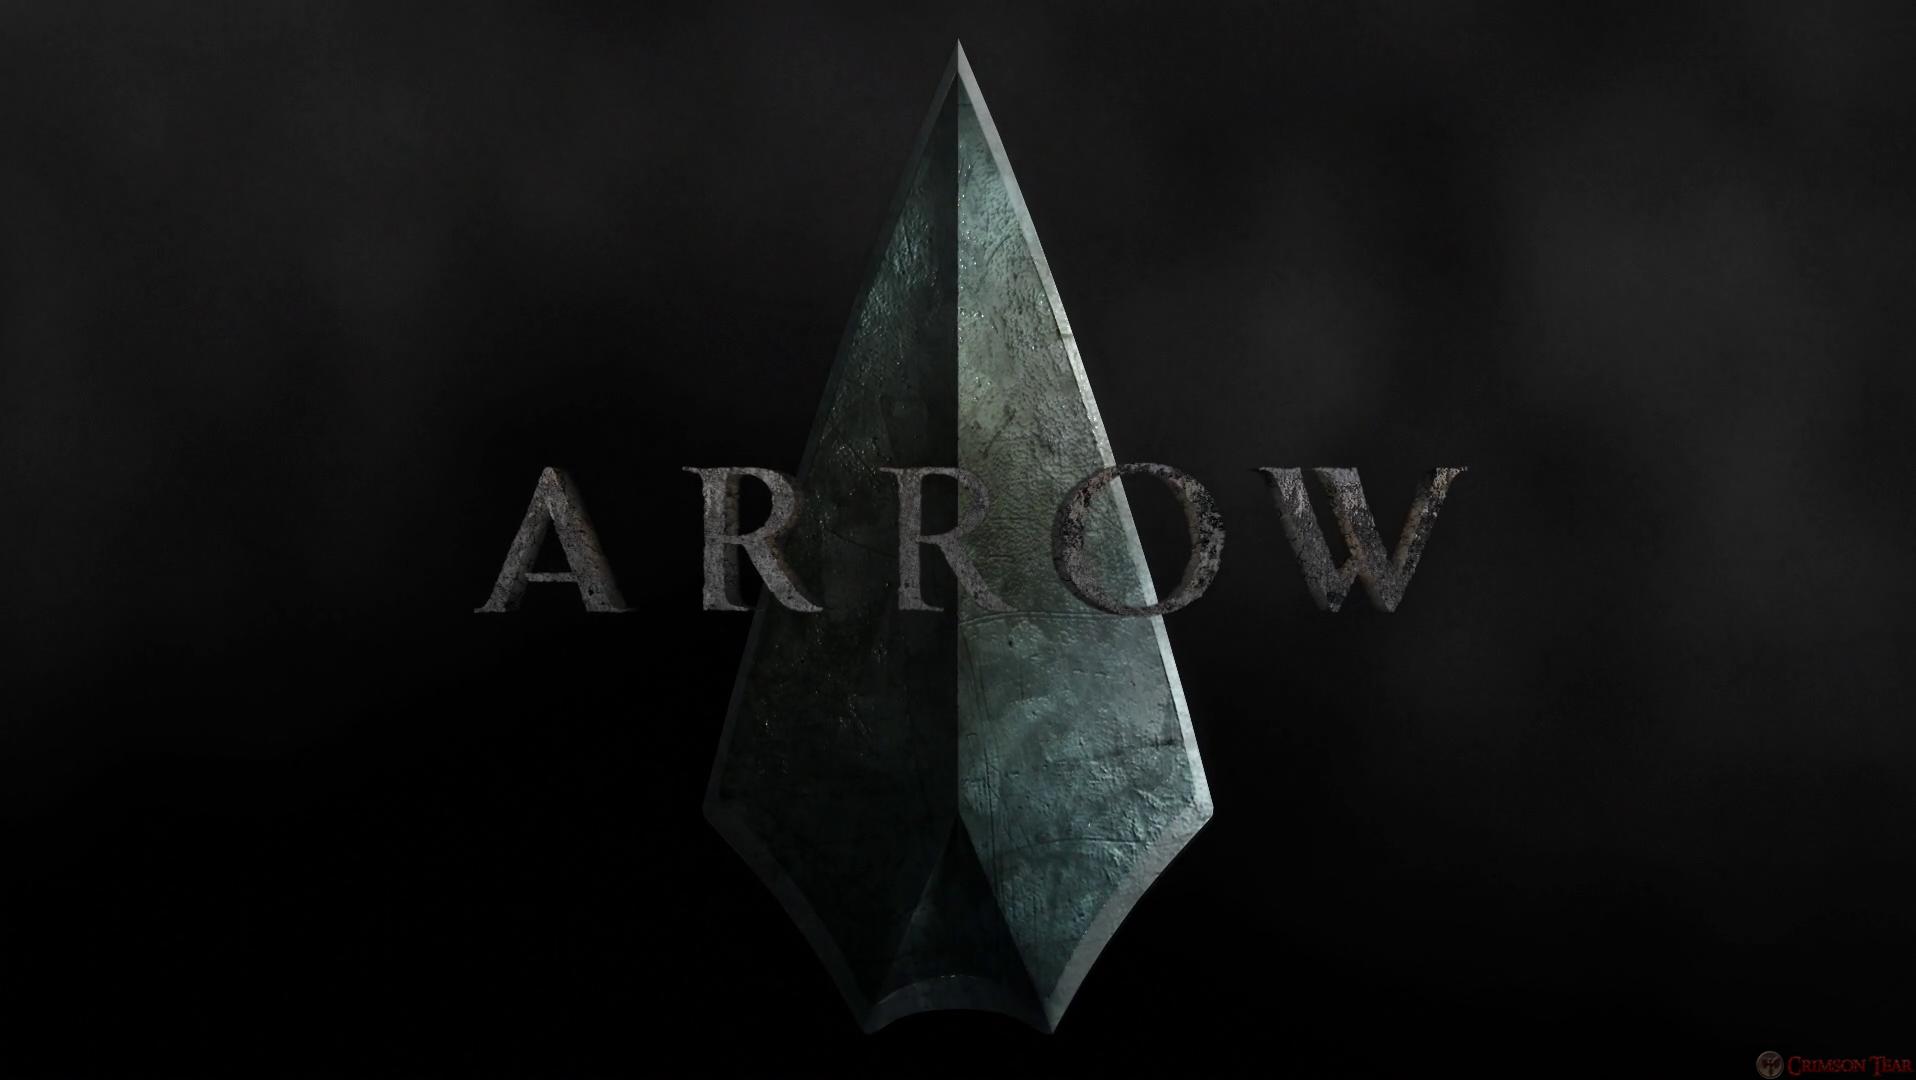 Arrow Desktop Wallpaper 1916x1080